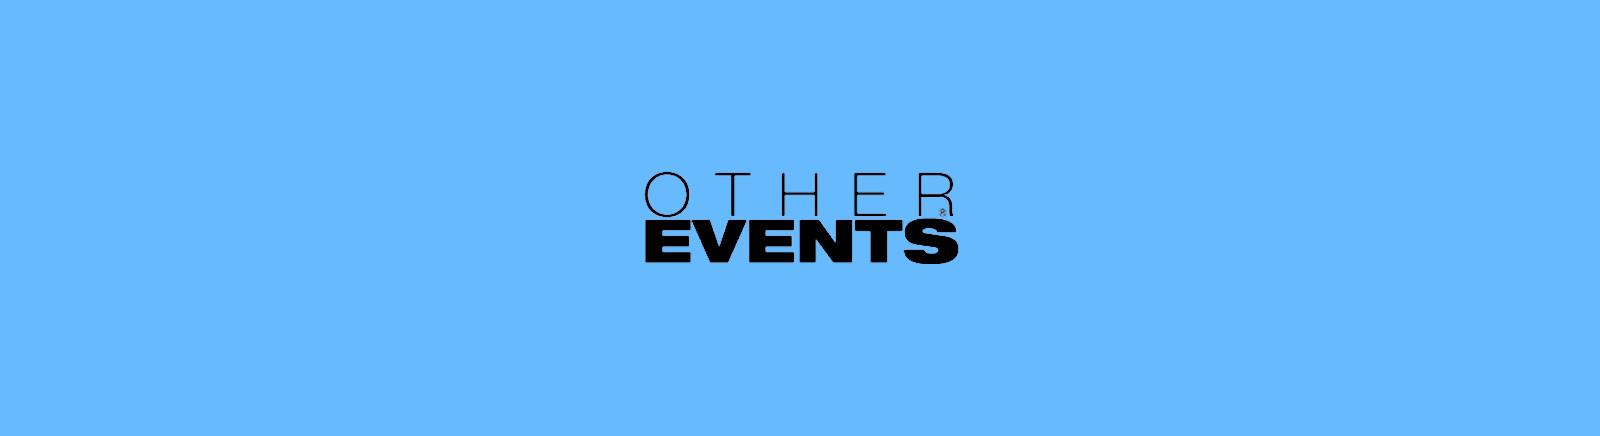 Other Events Herrenschuhe online entdecken im Juppen Shop